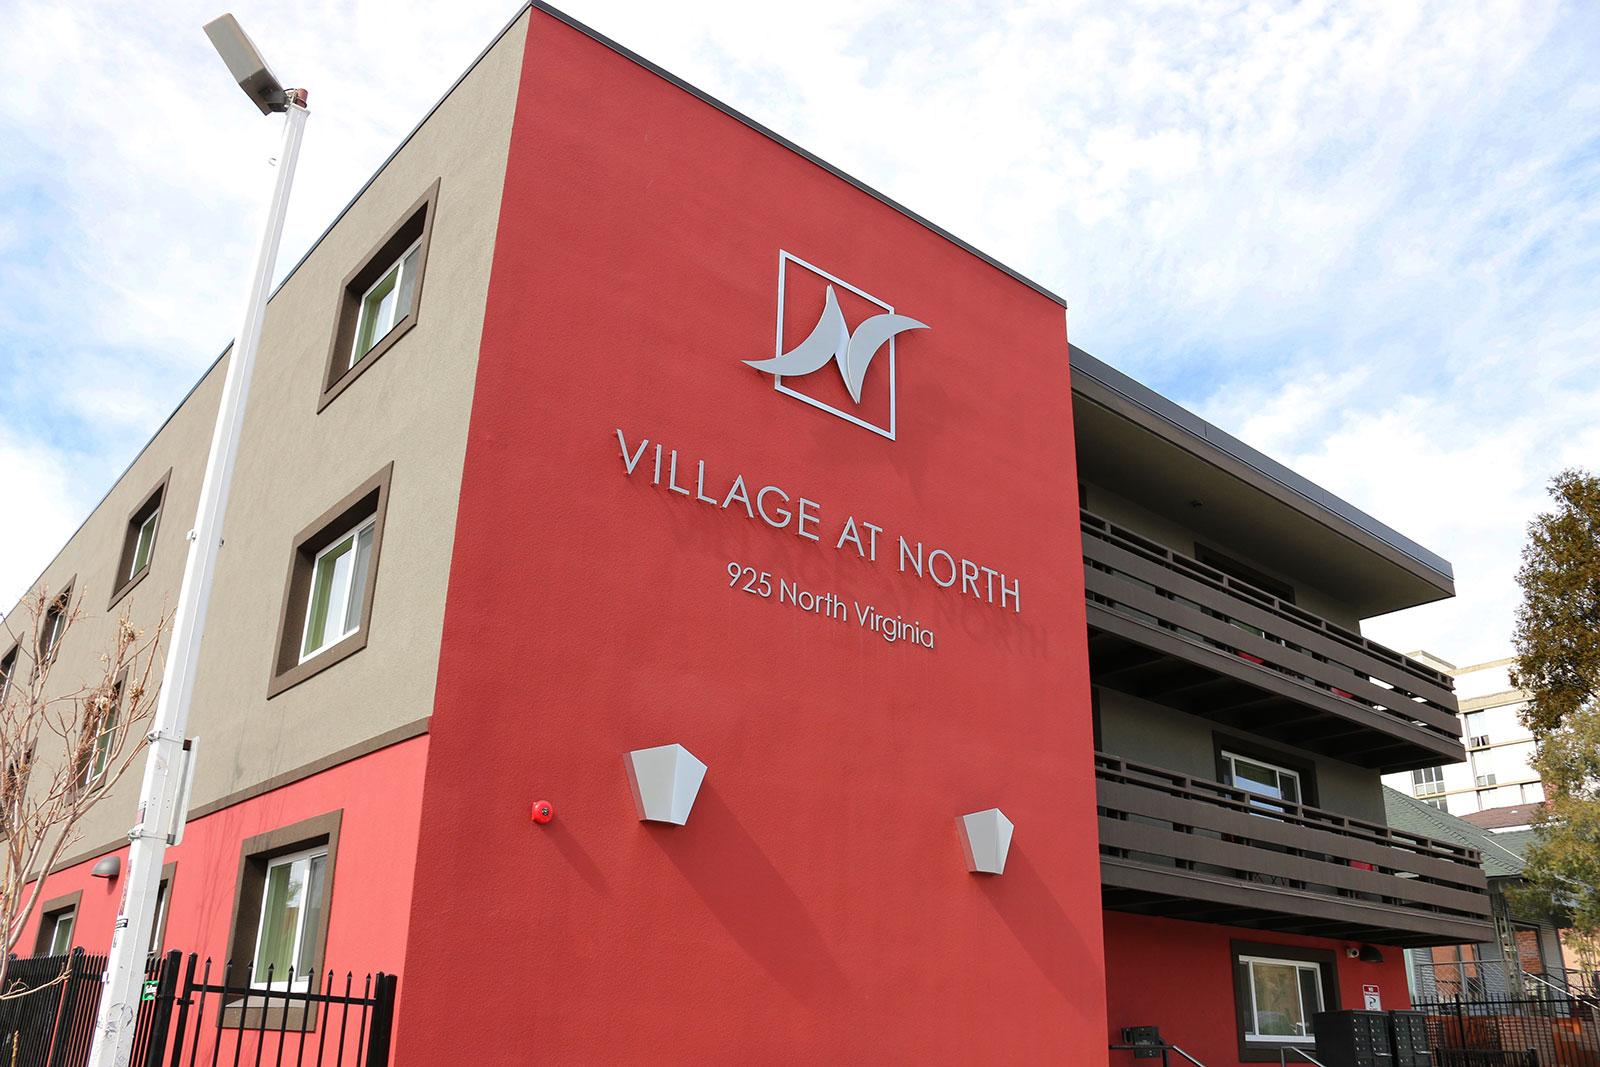 Village at North